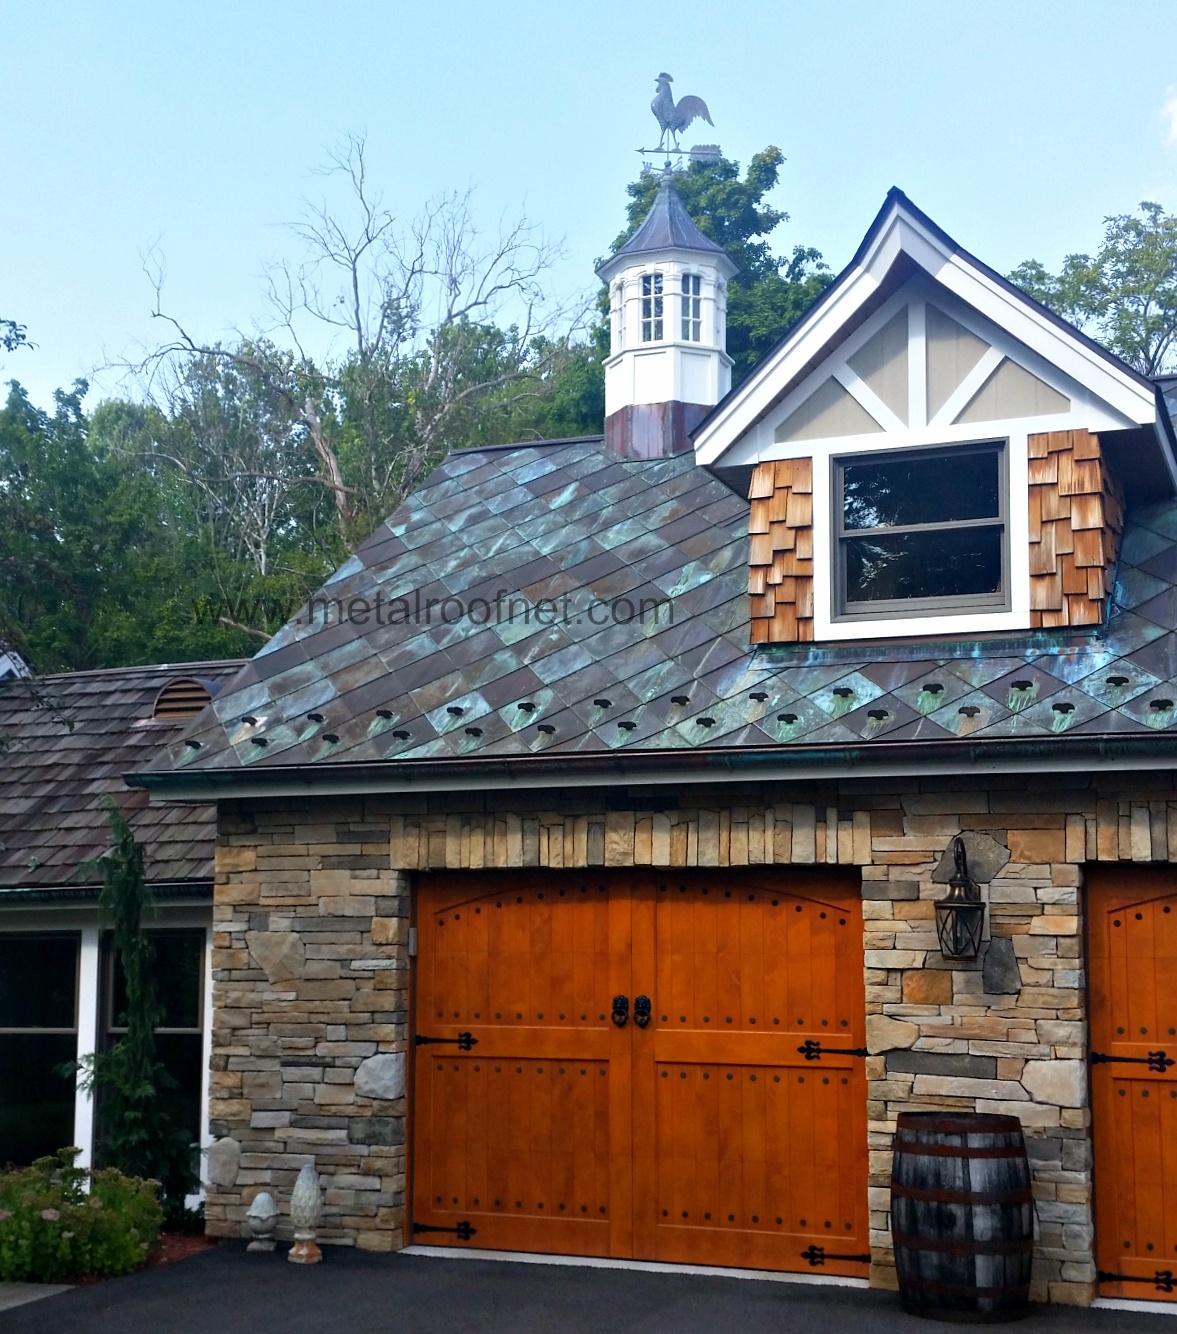 Custom Copper Shingle Roof for A Custom Home